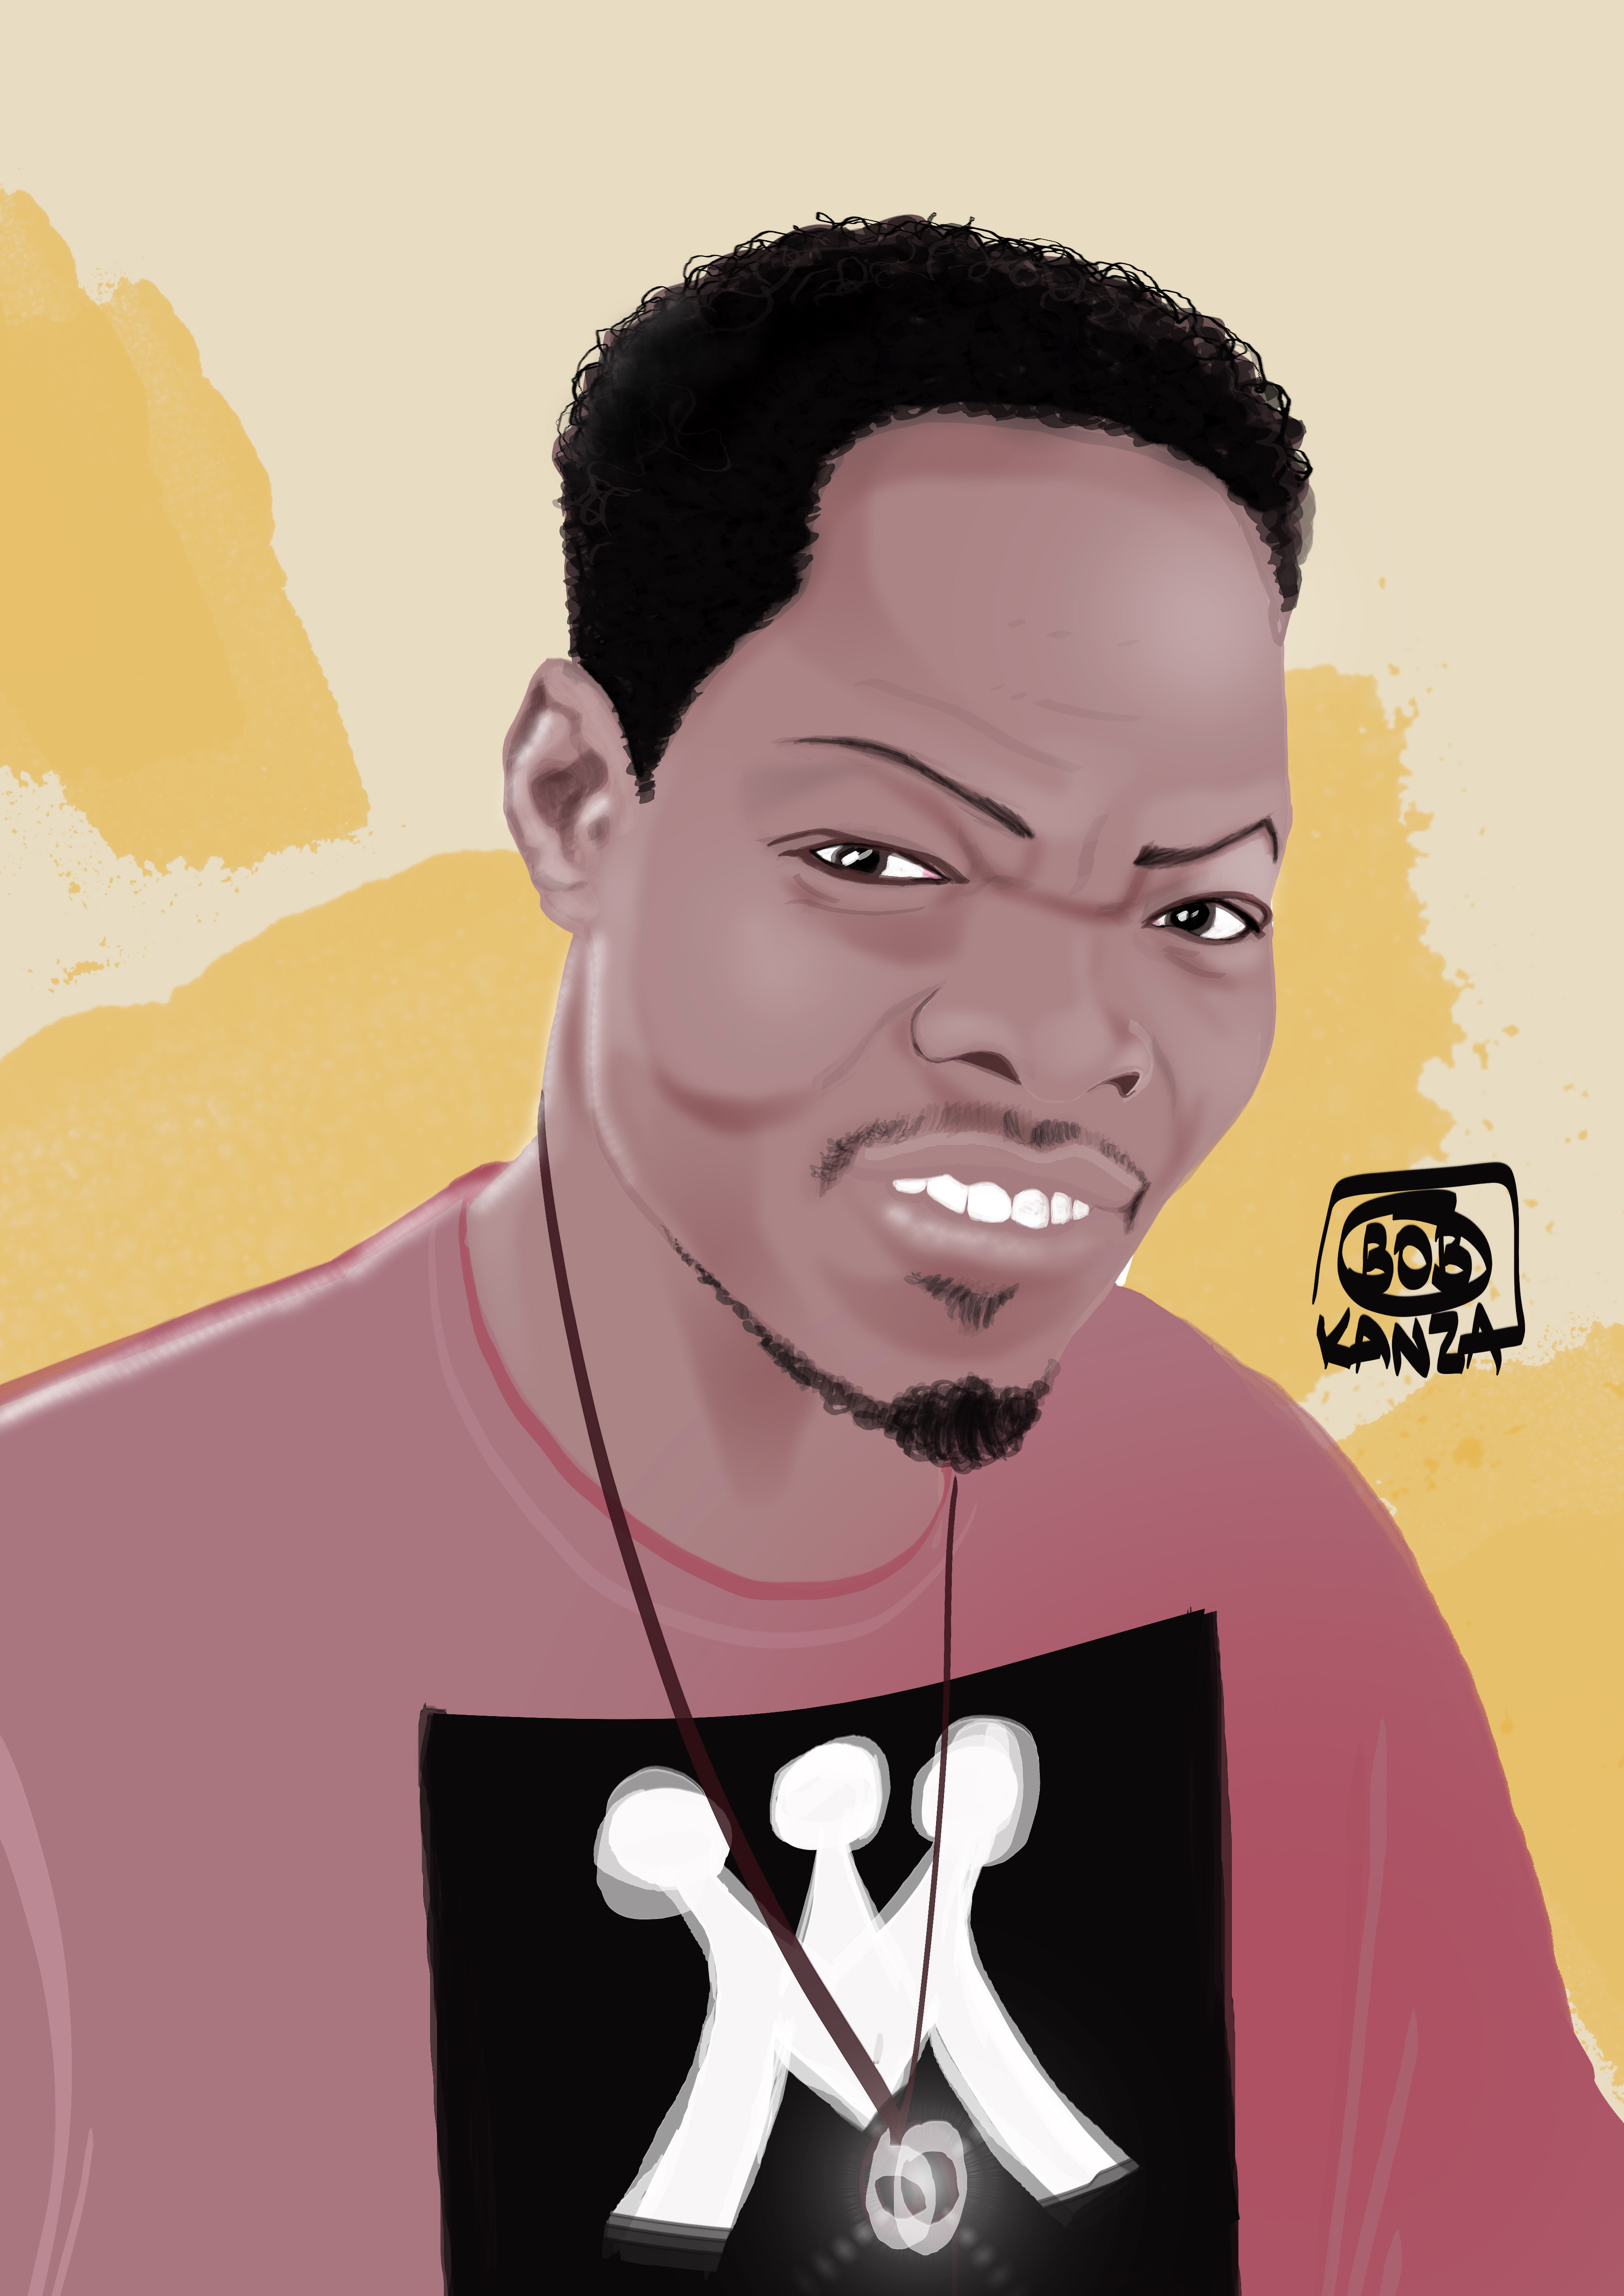 Portrait digital art Africain - Bob Kanza